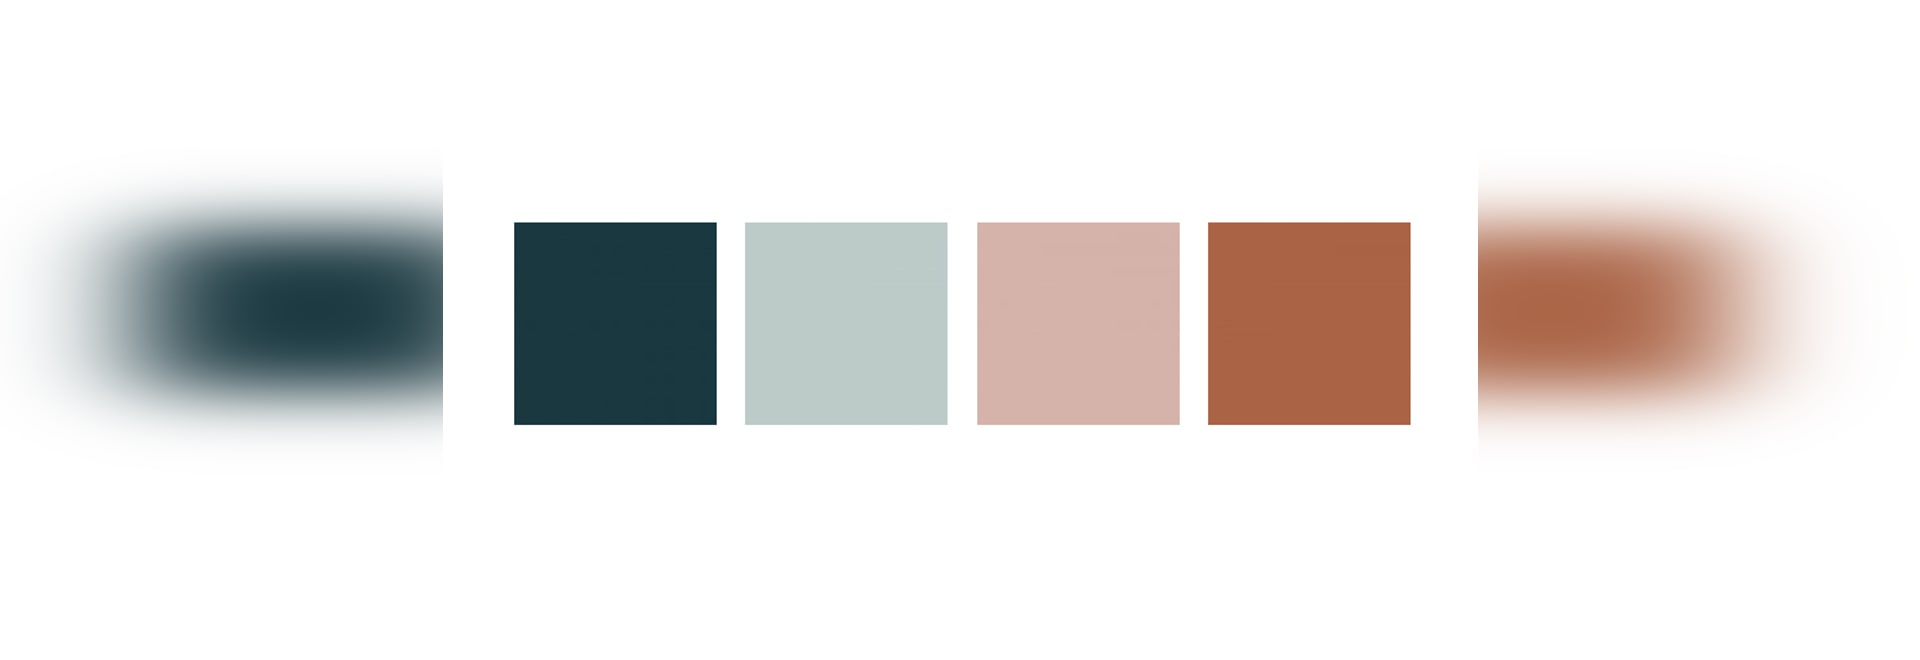 2019 trendy colors